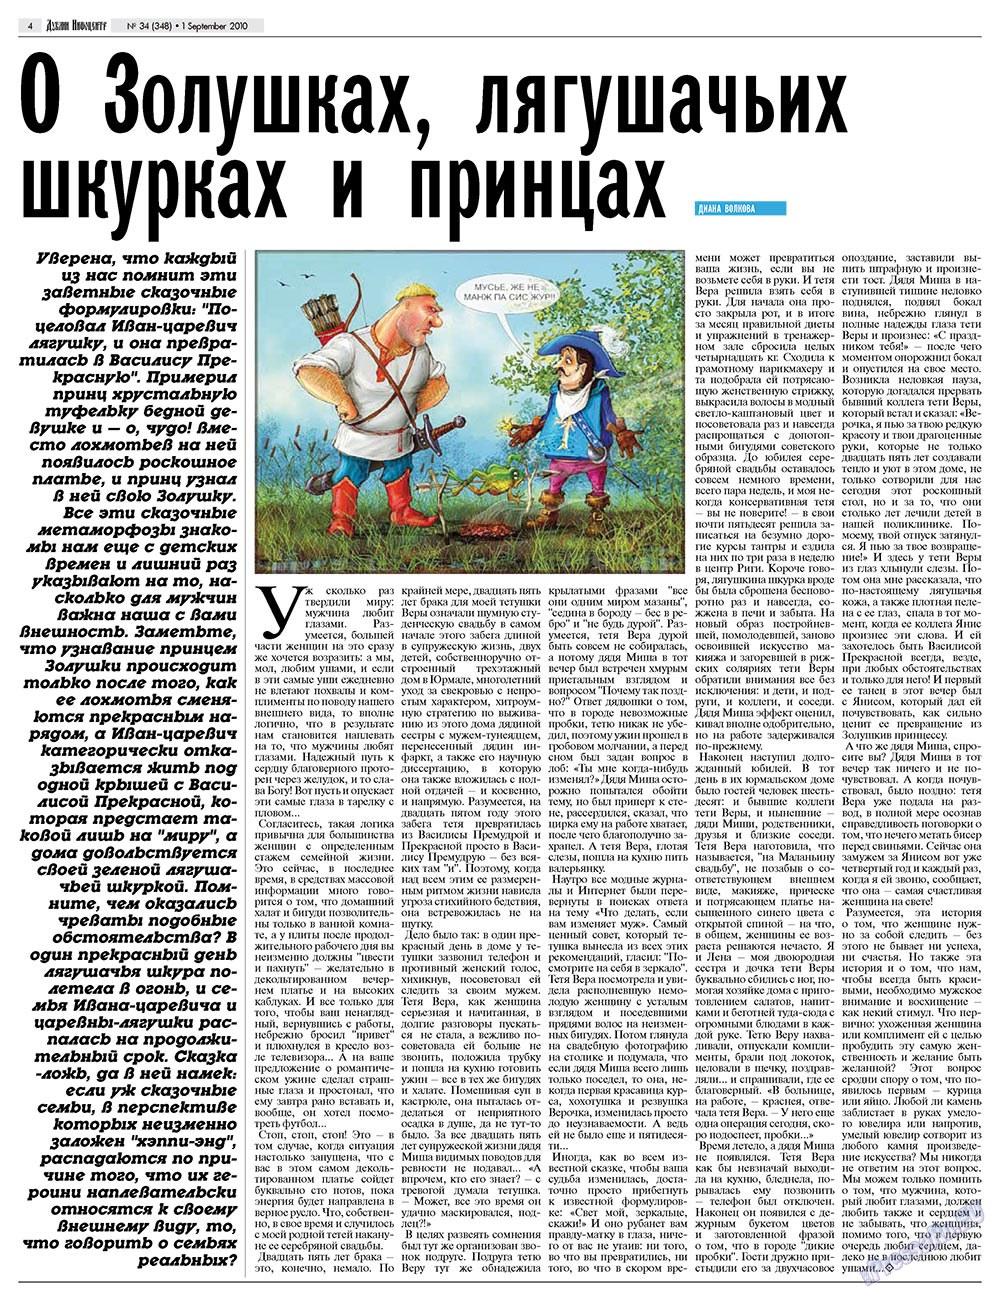 Дублин инфоцентр (газета). 2010 год, номер 34, стр. 4